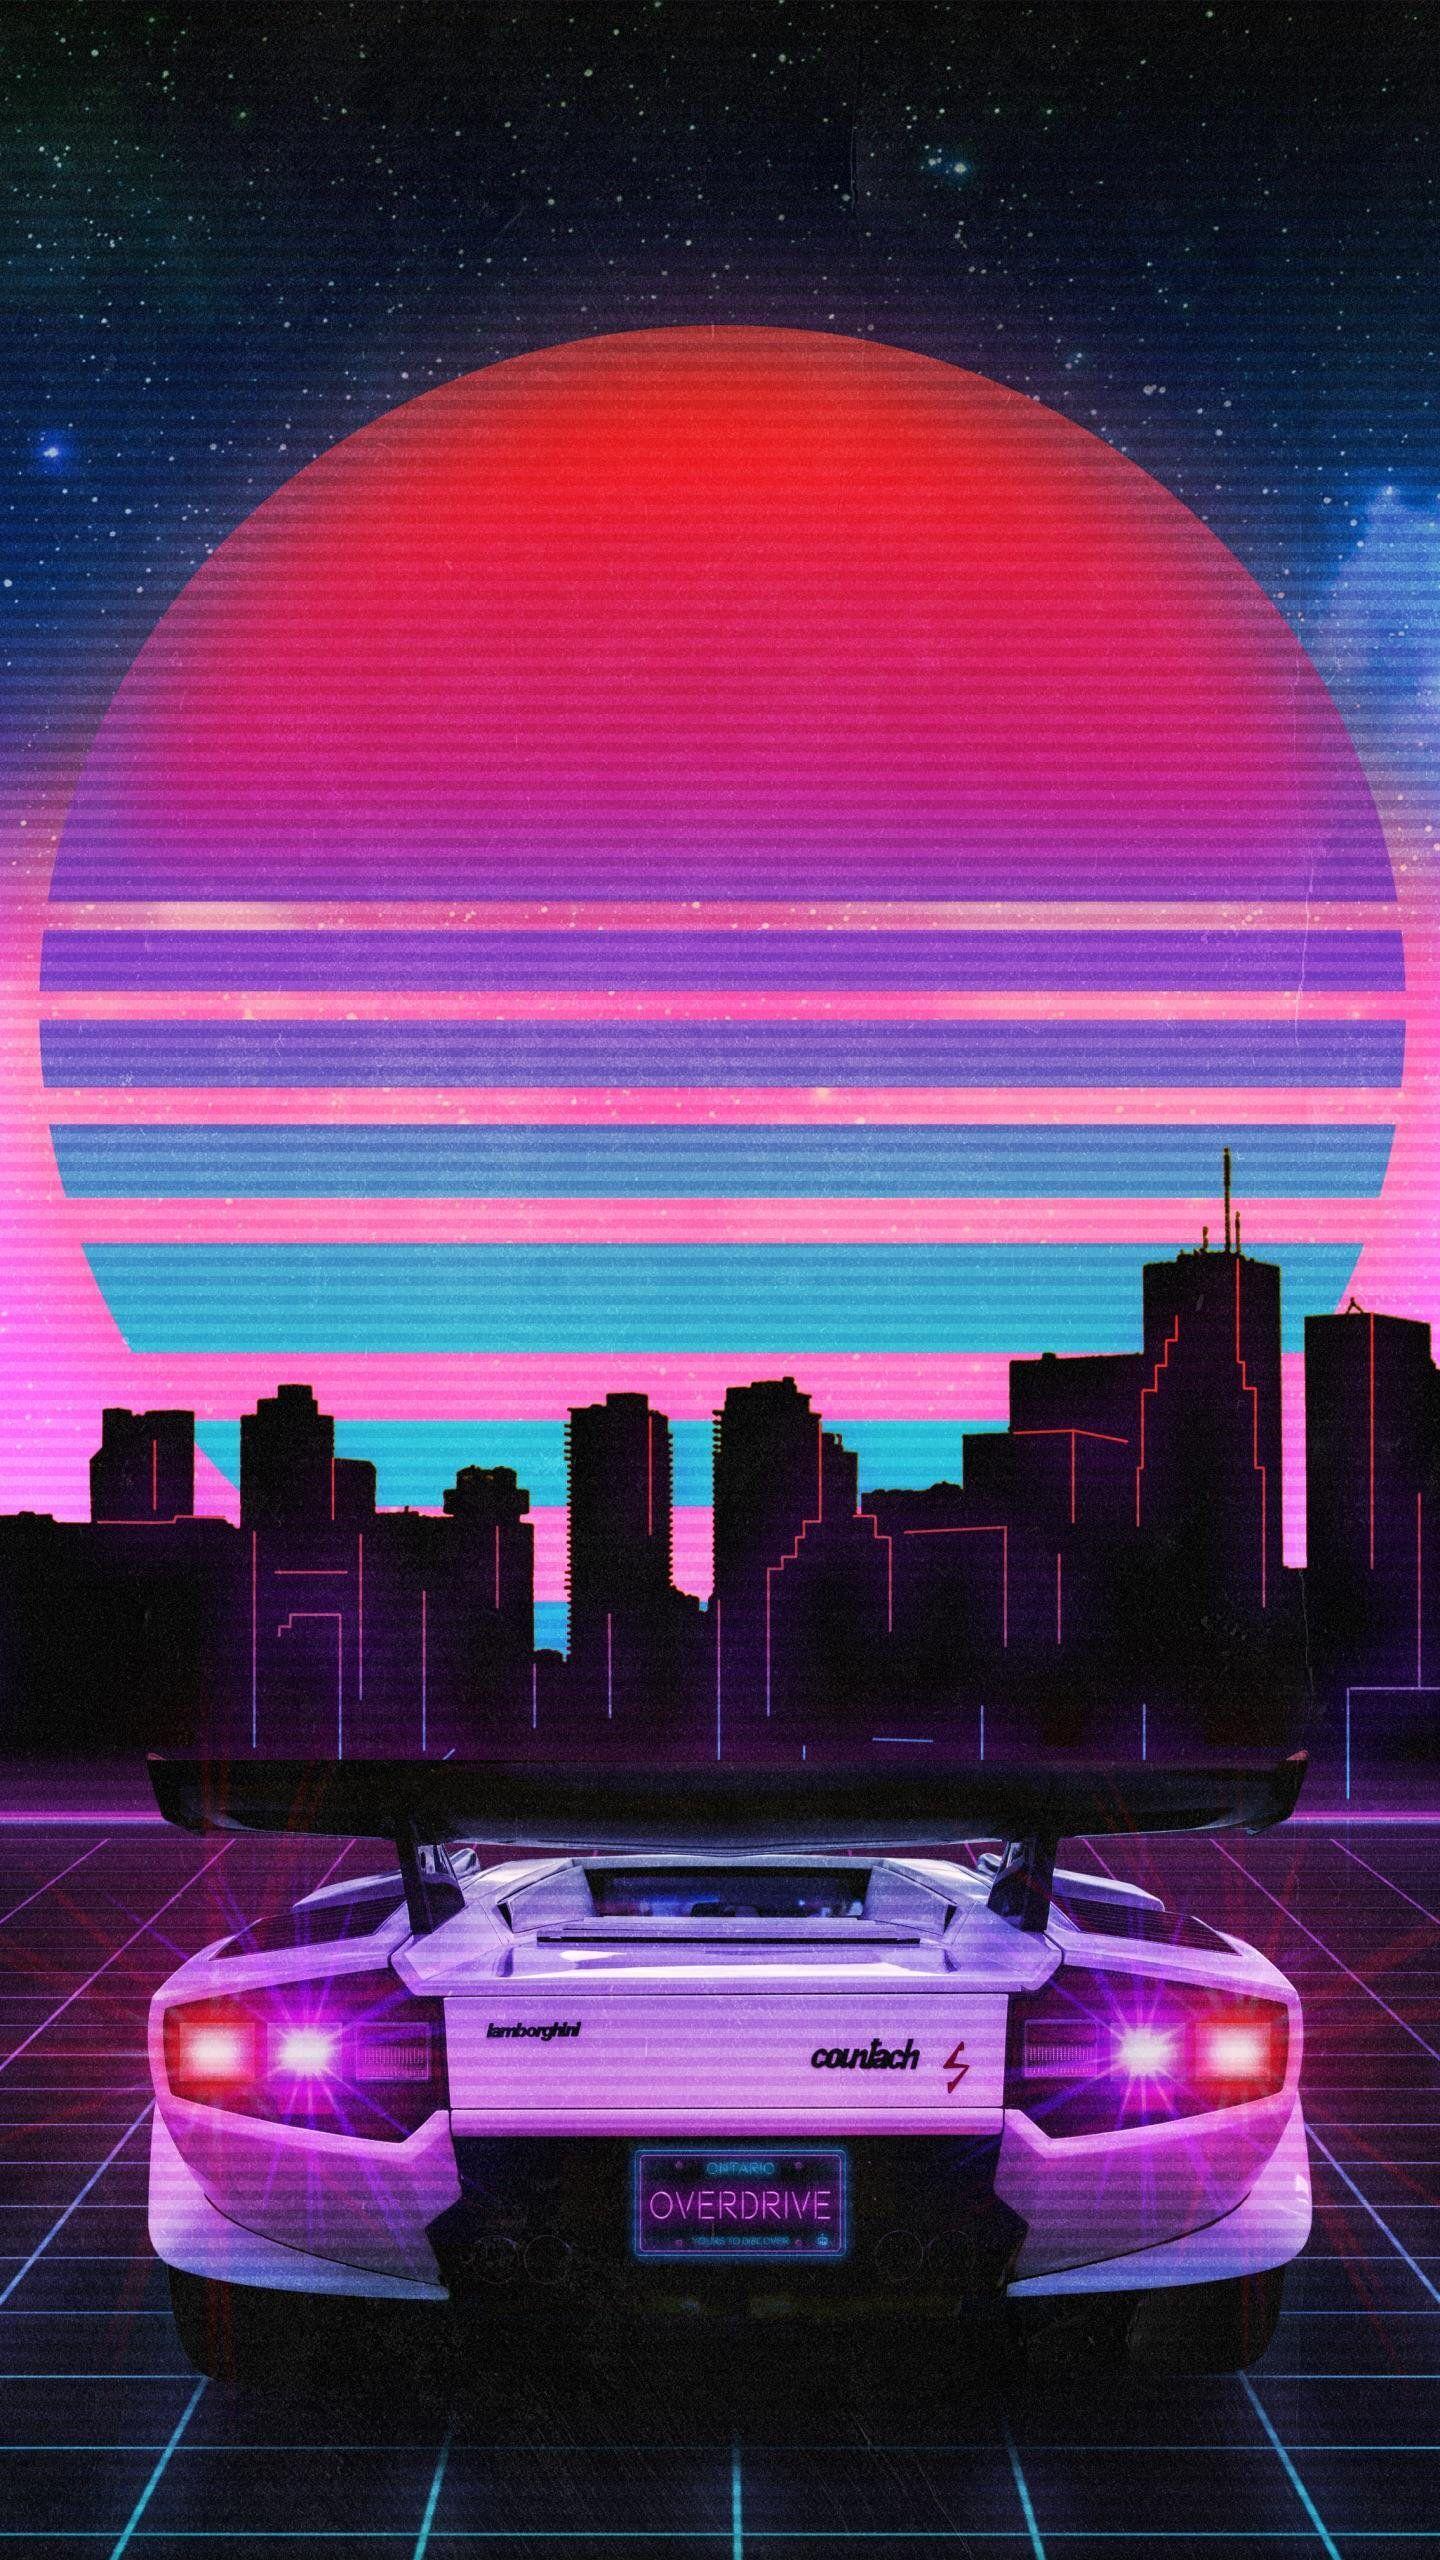 Stylish Car En 2020 Fond D Ecran Vaporwave Fond D Ecran Ville Neon City